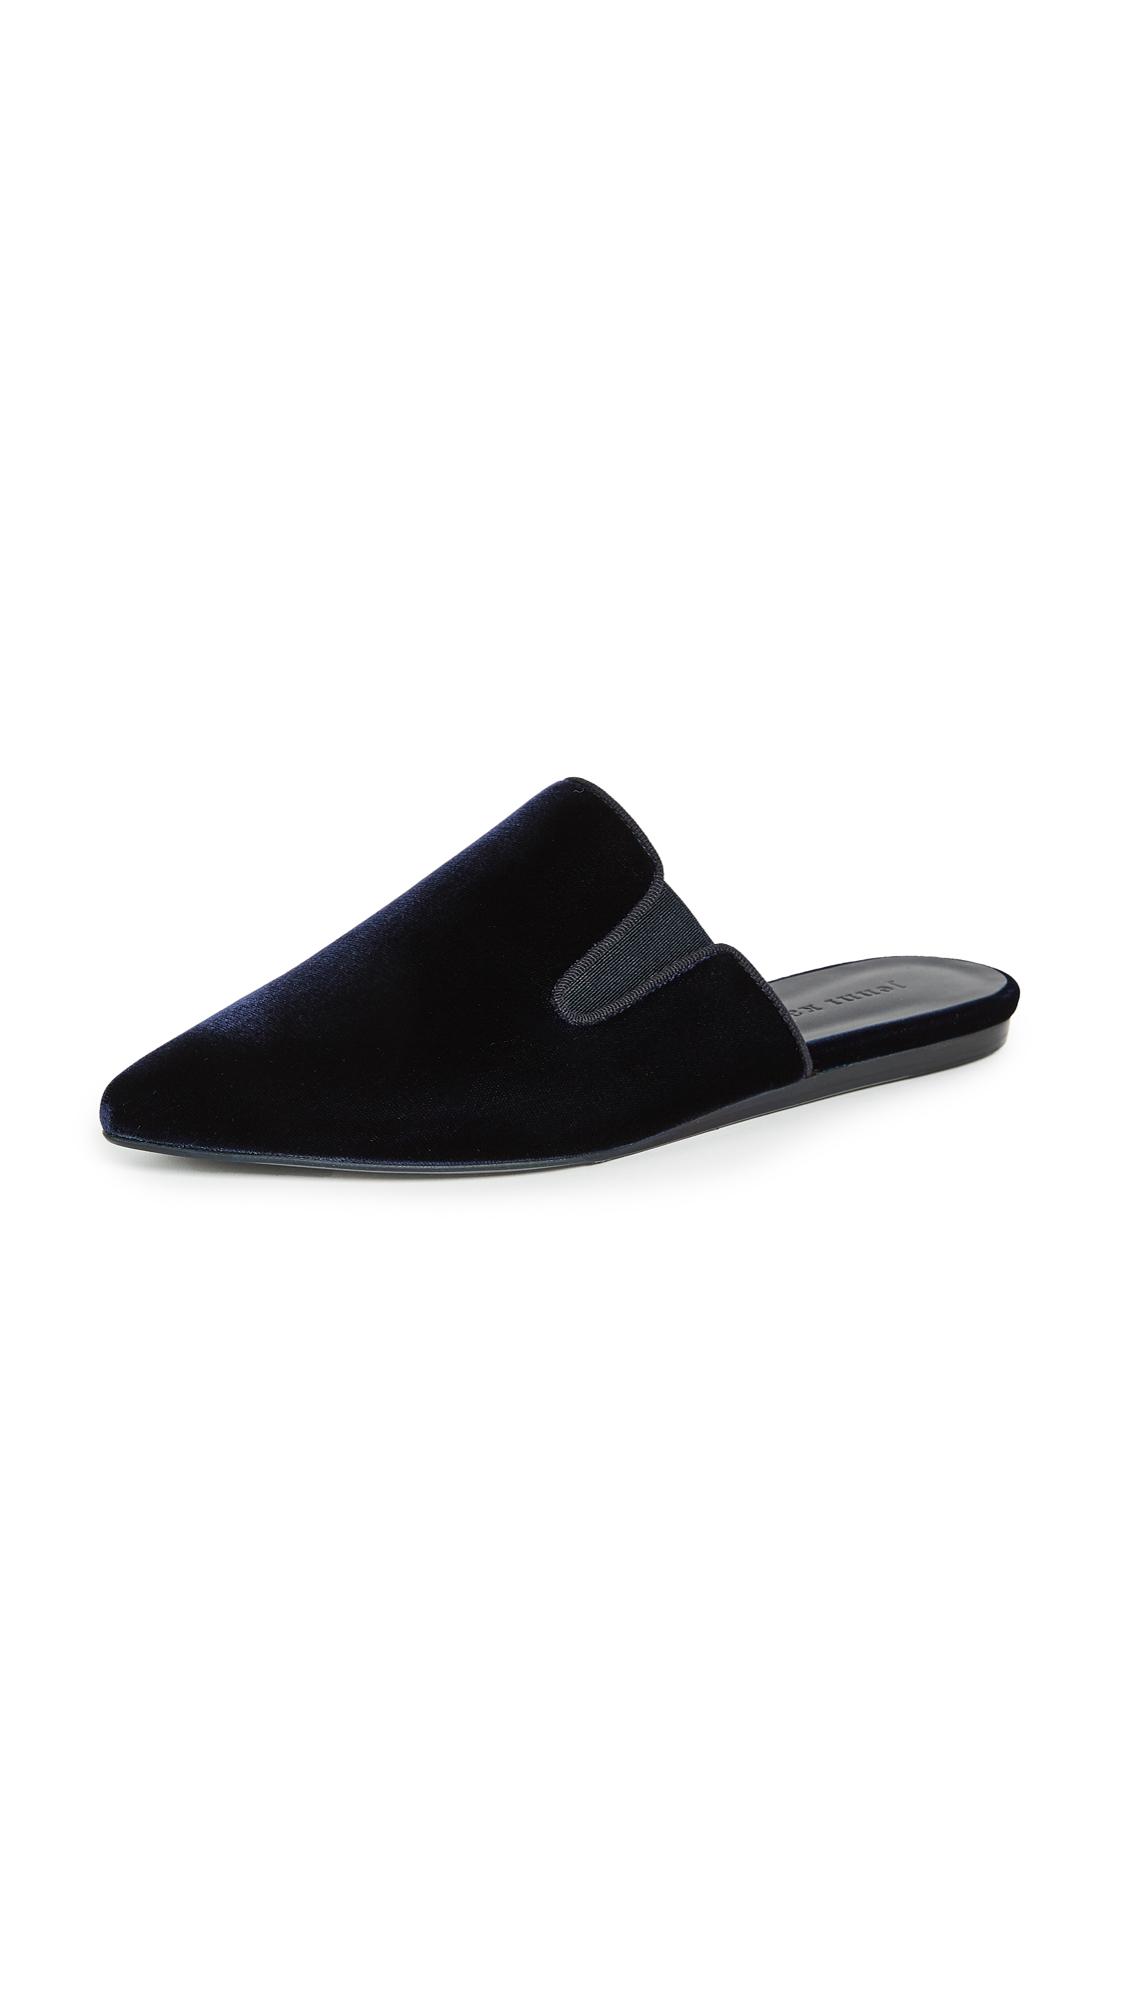 Photo of Jenni Kayne Velvet Mules - buy Jenni Kayne shoes